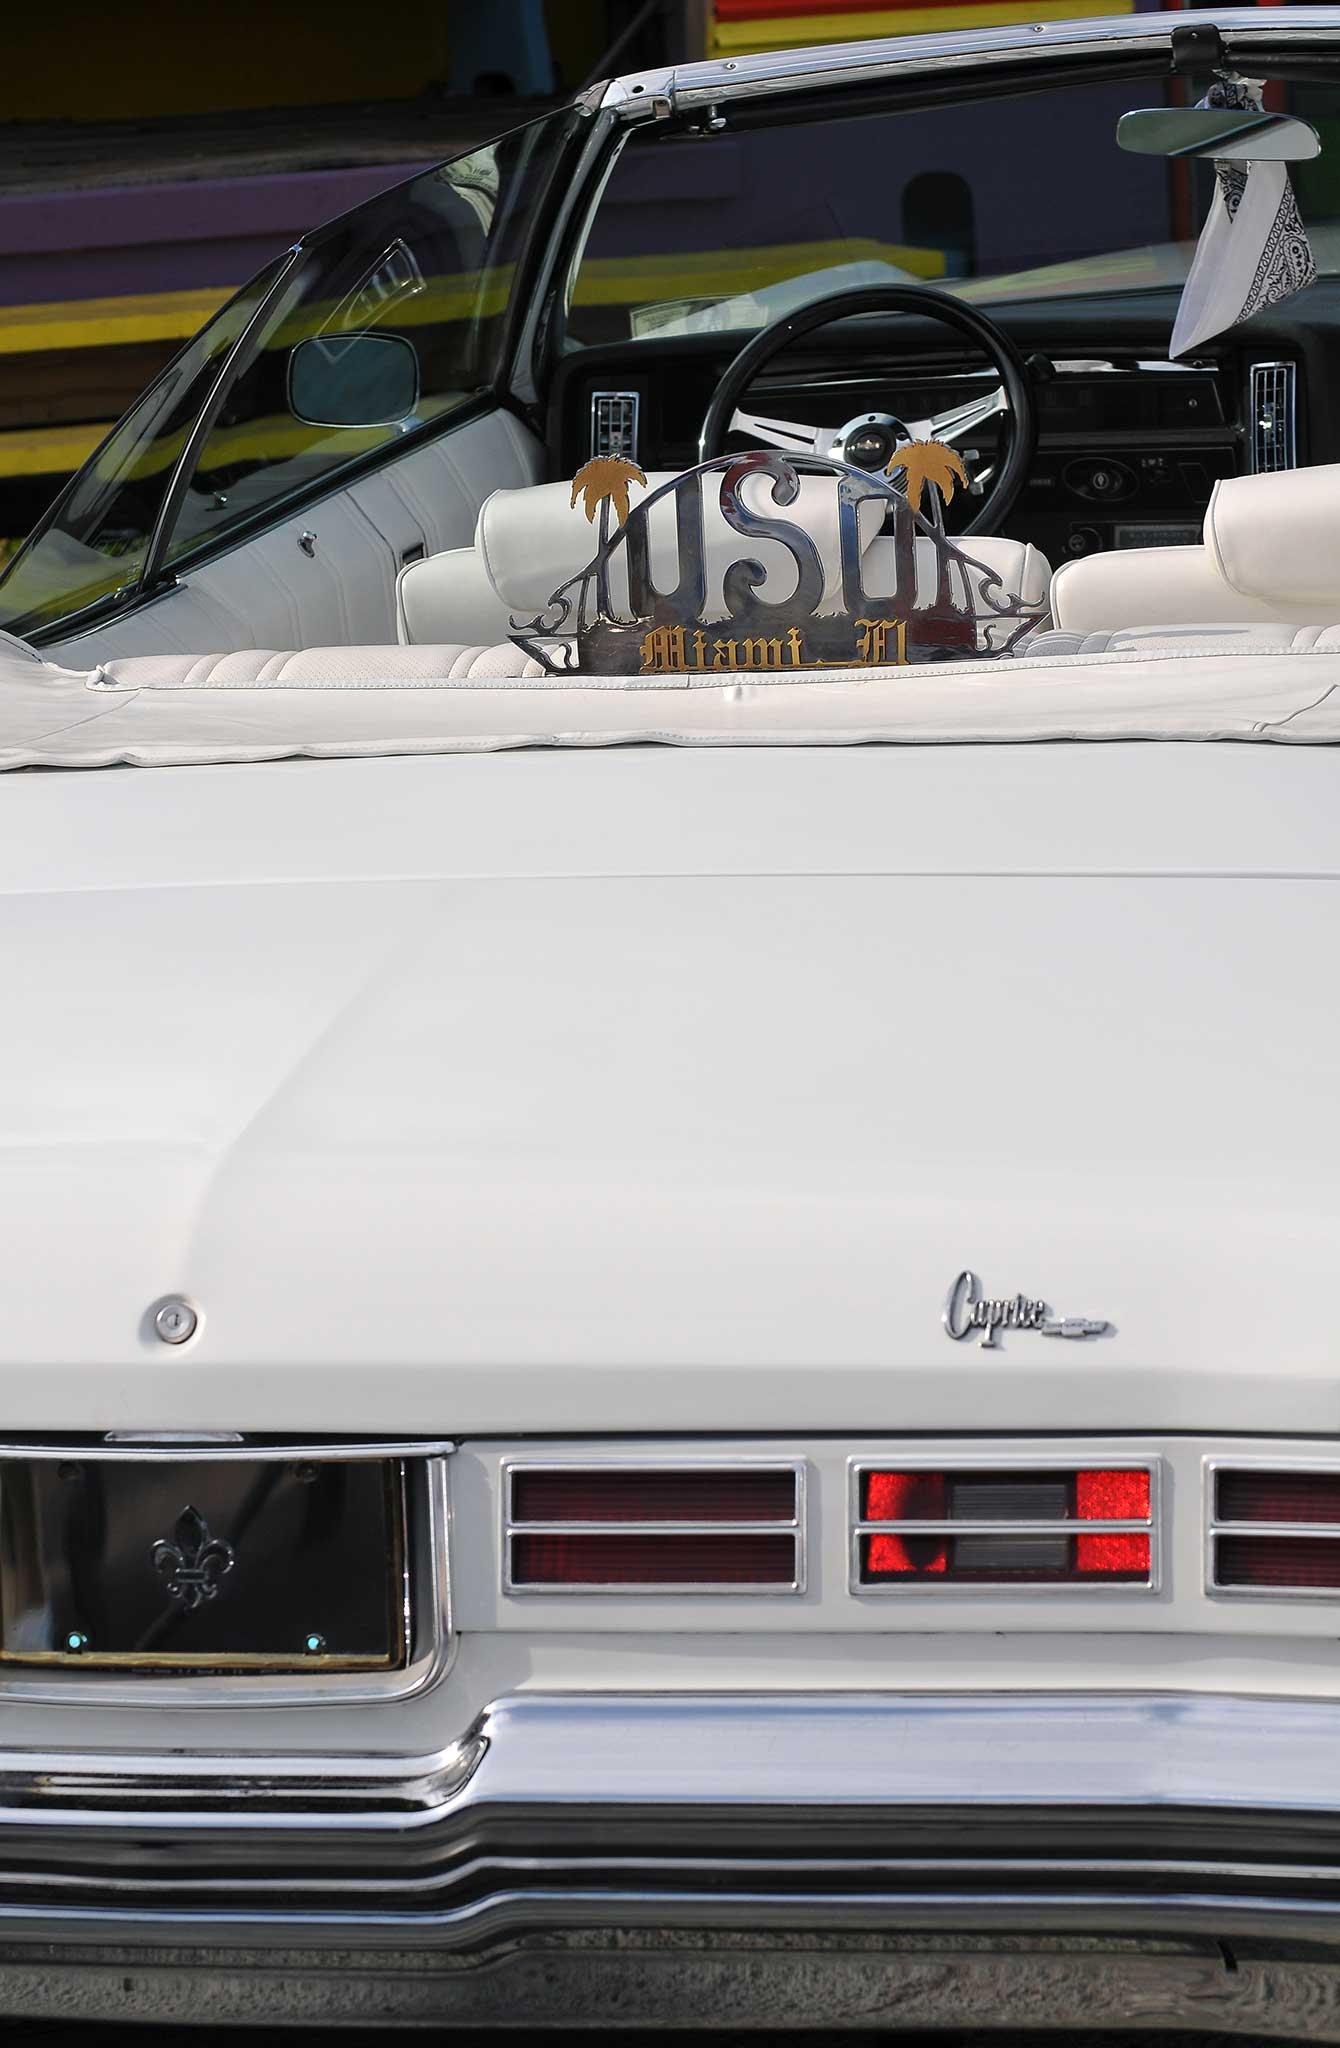 1975-chevrolet-caprice-classic-taillight - Lowrider